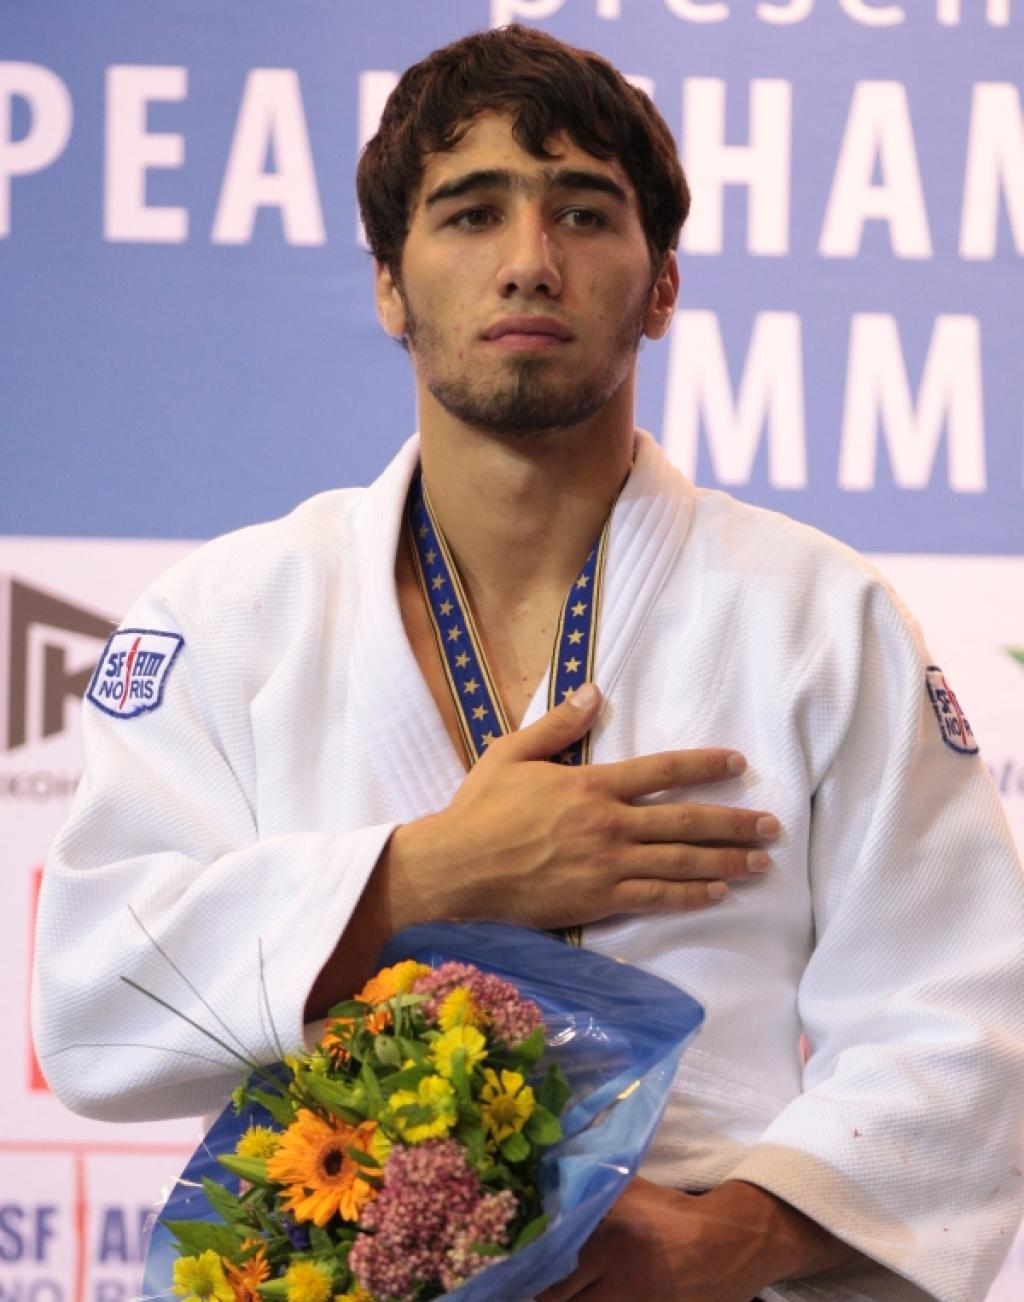 Khusen Khalmurzaev takes gold and copies brother Khasan